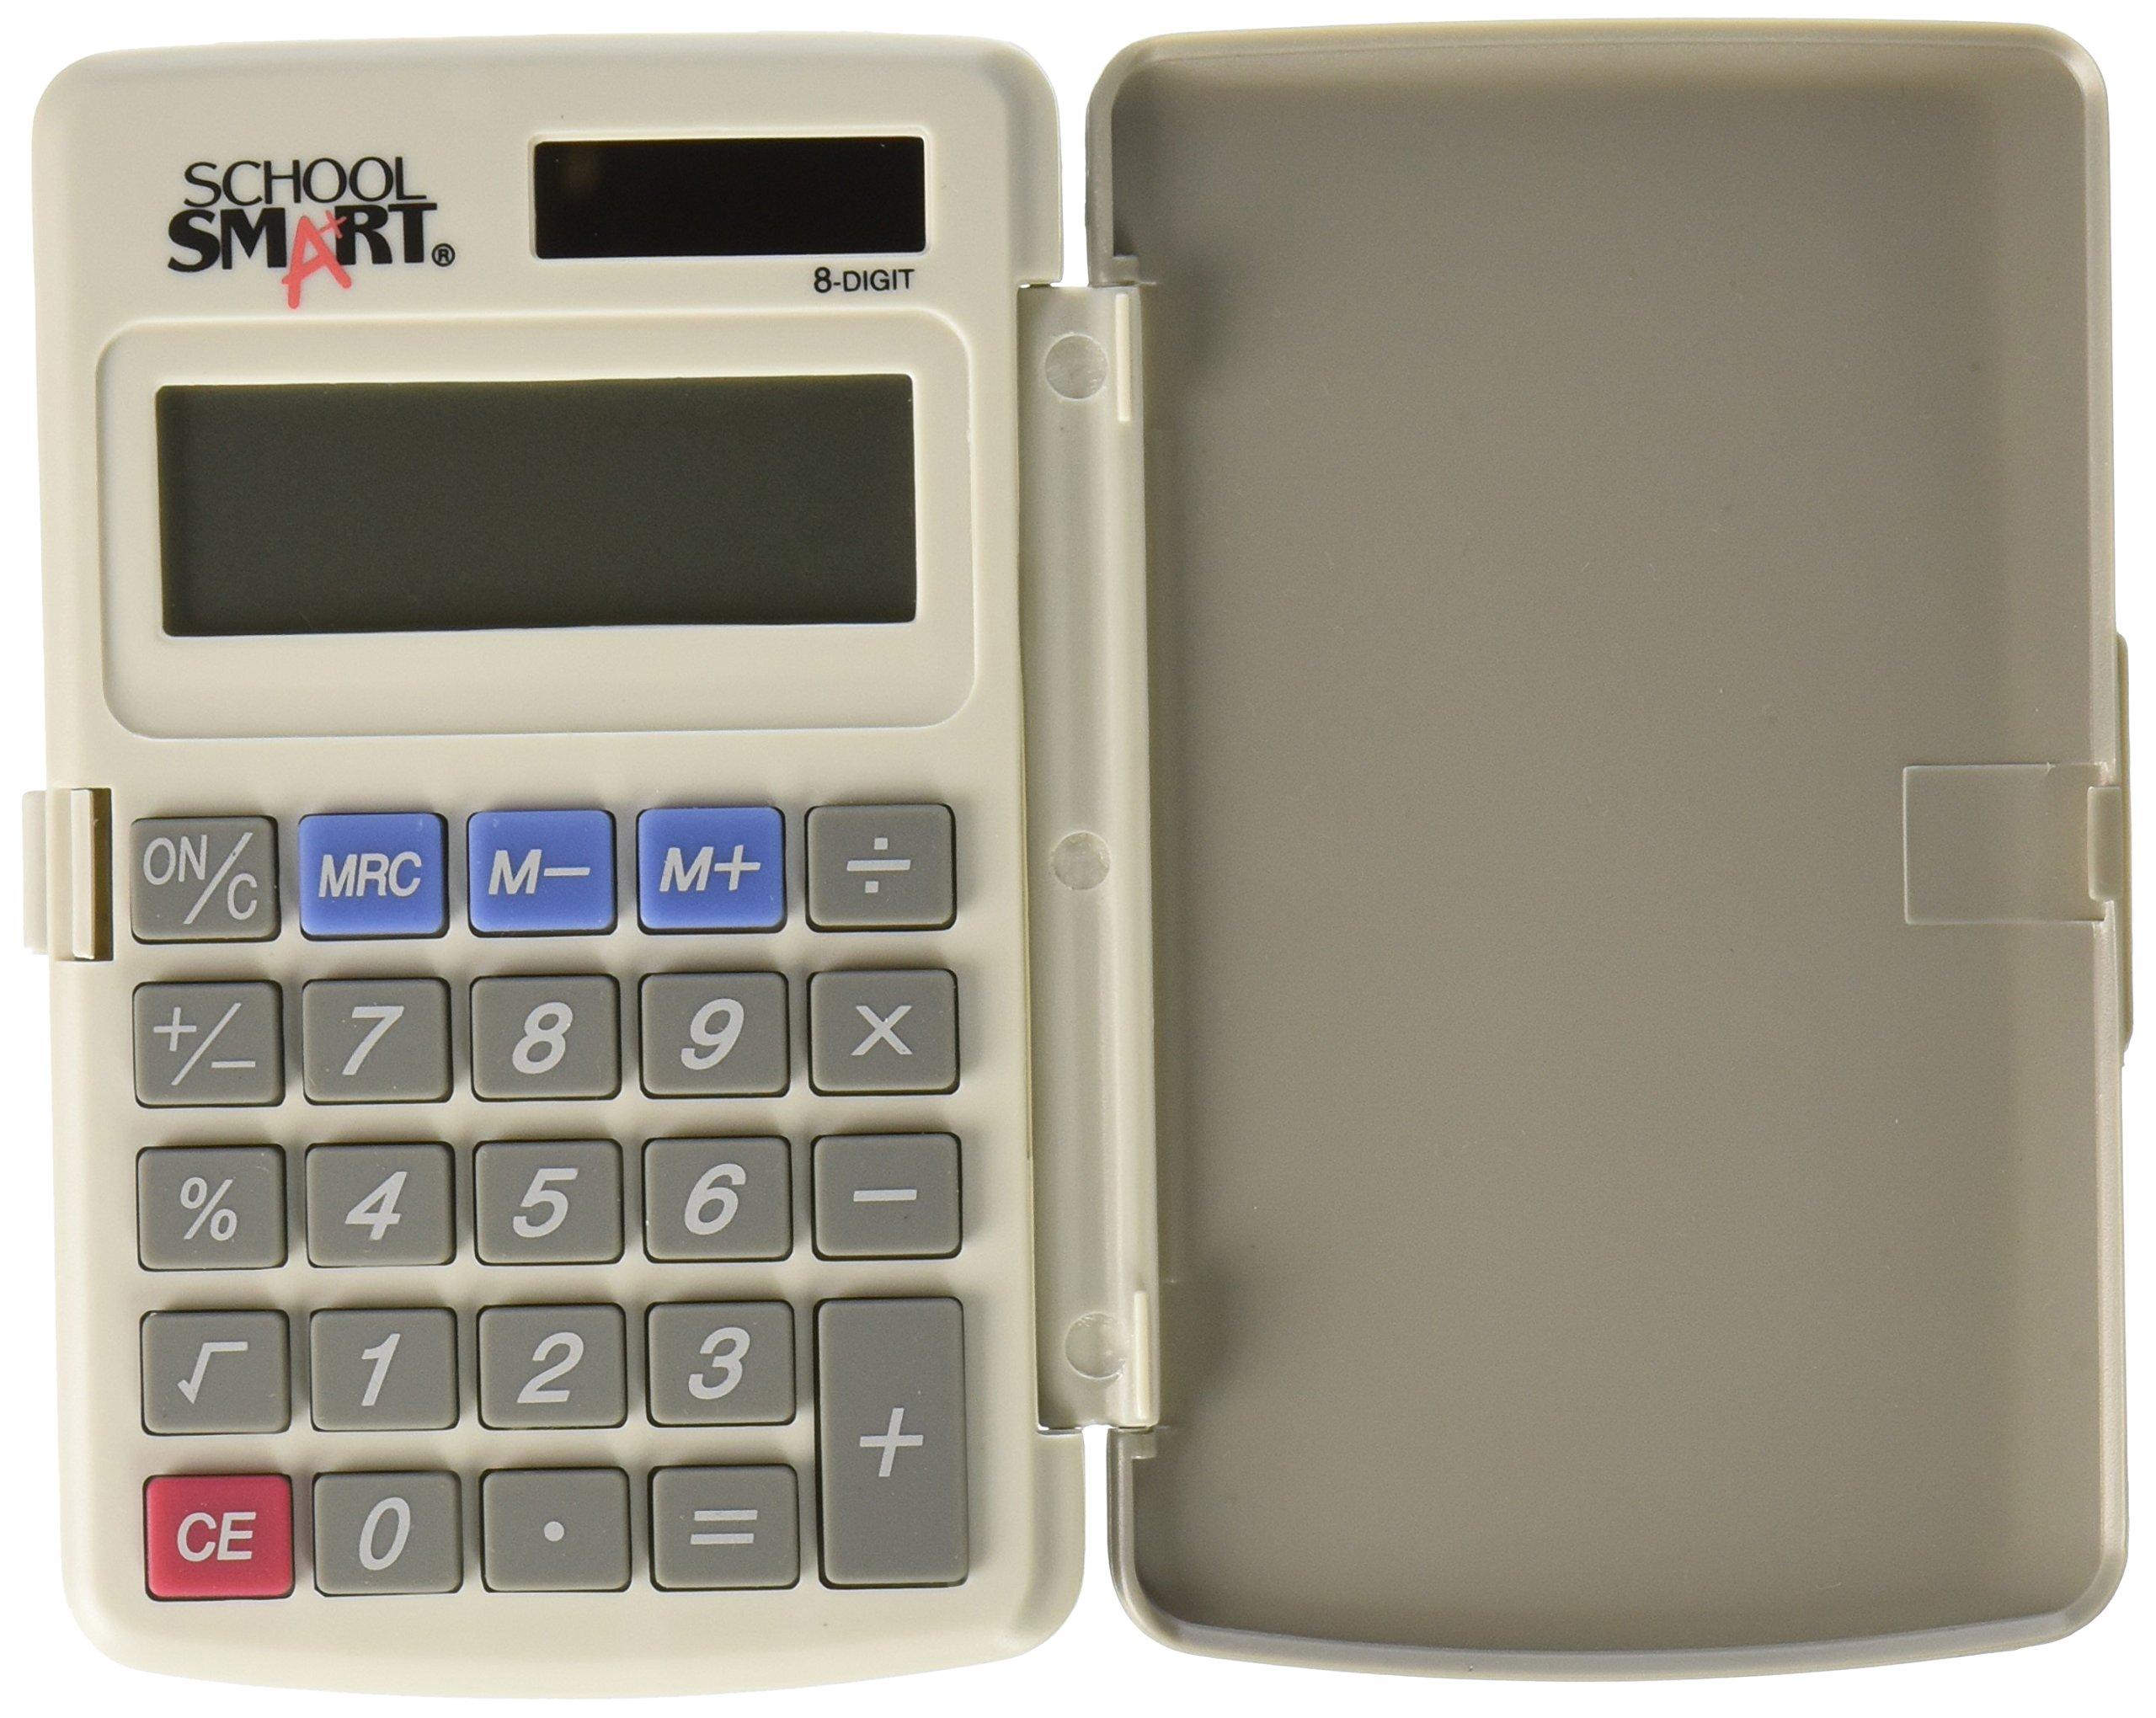 School Smart Pocket Calculator